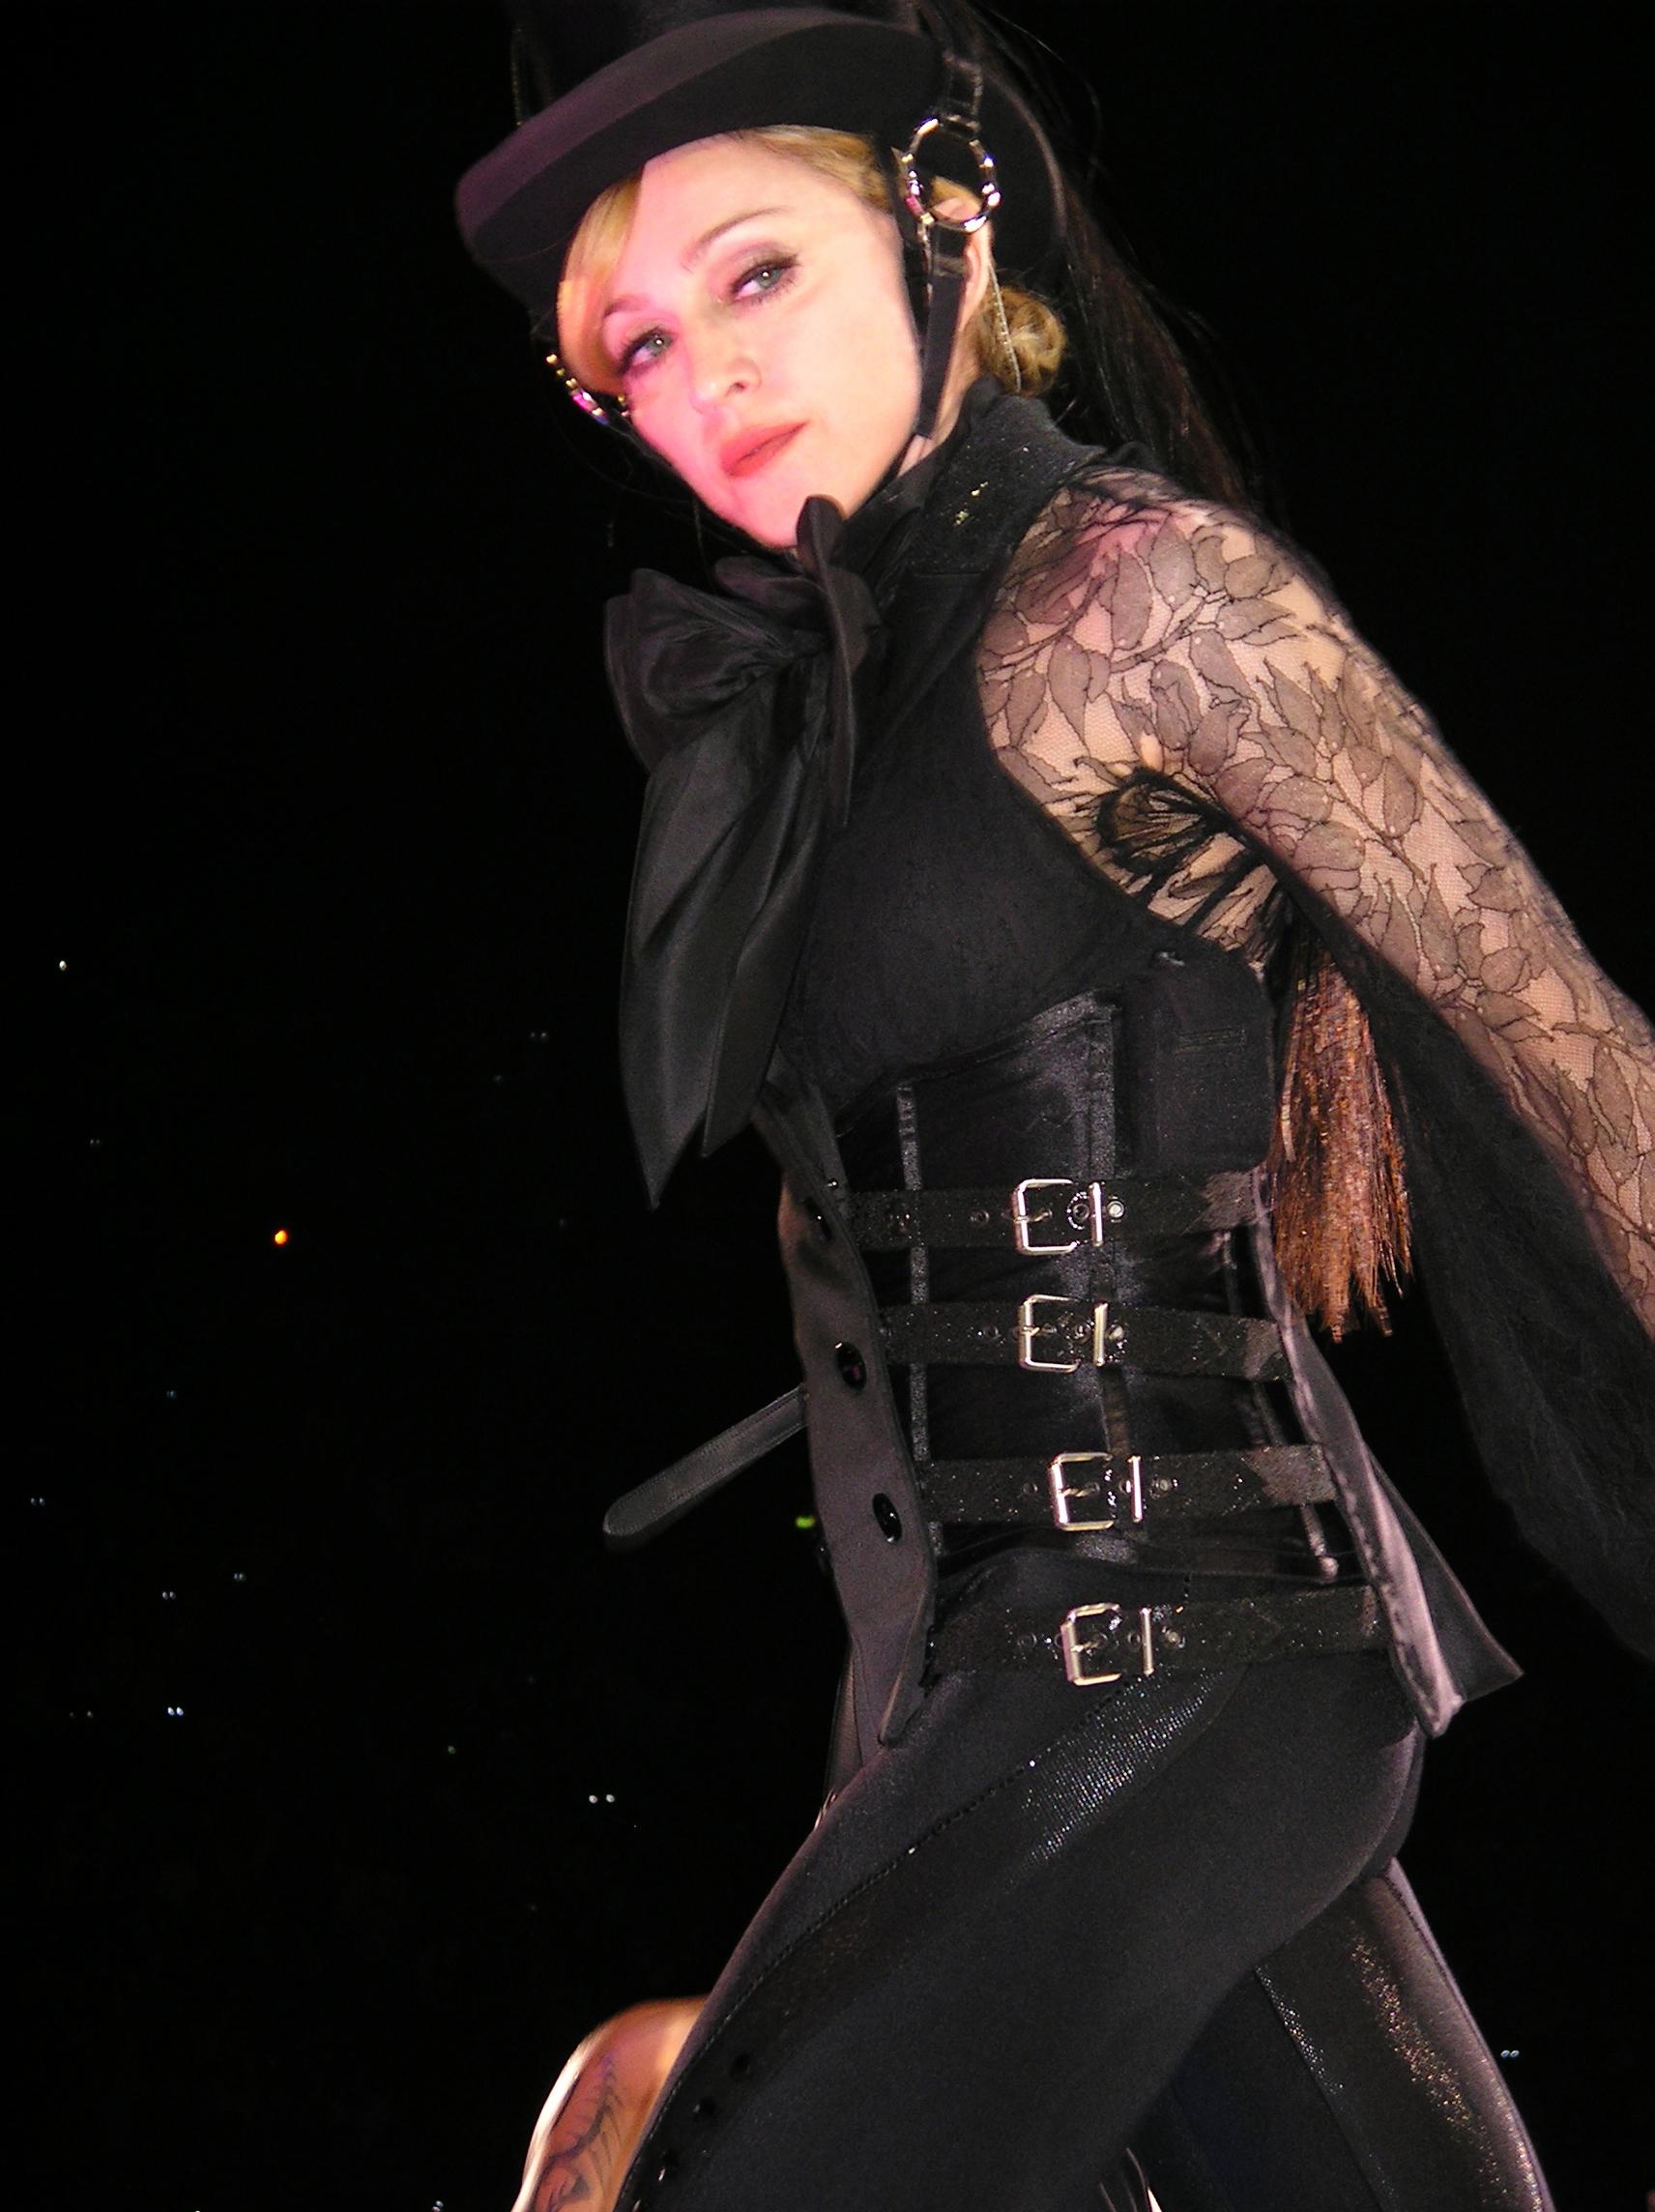 madonna 2006 - photo #33